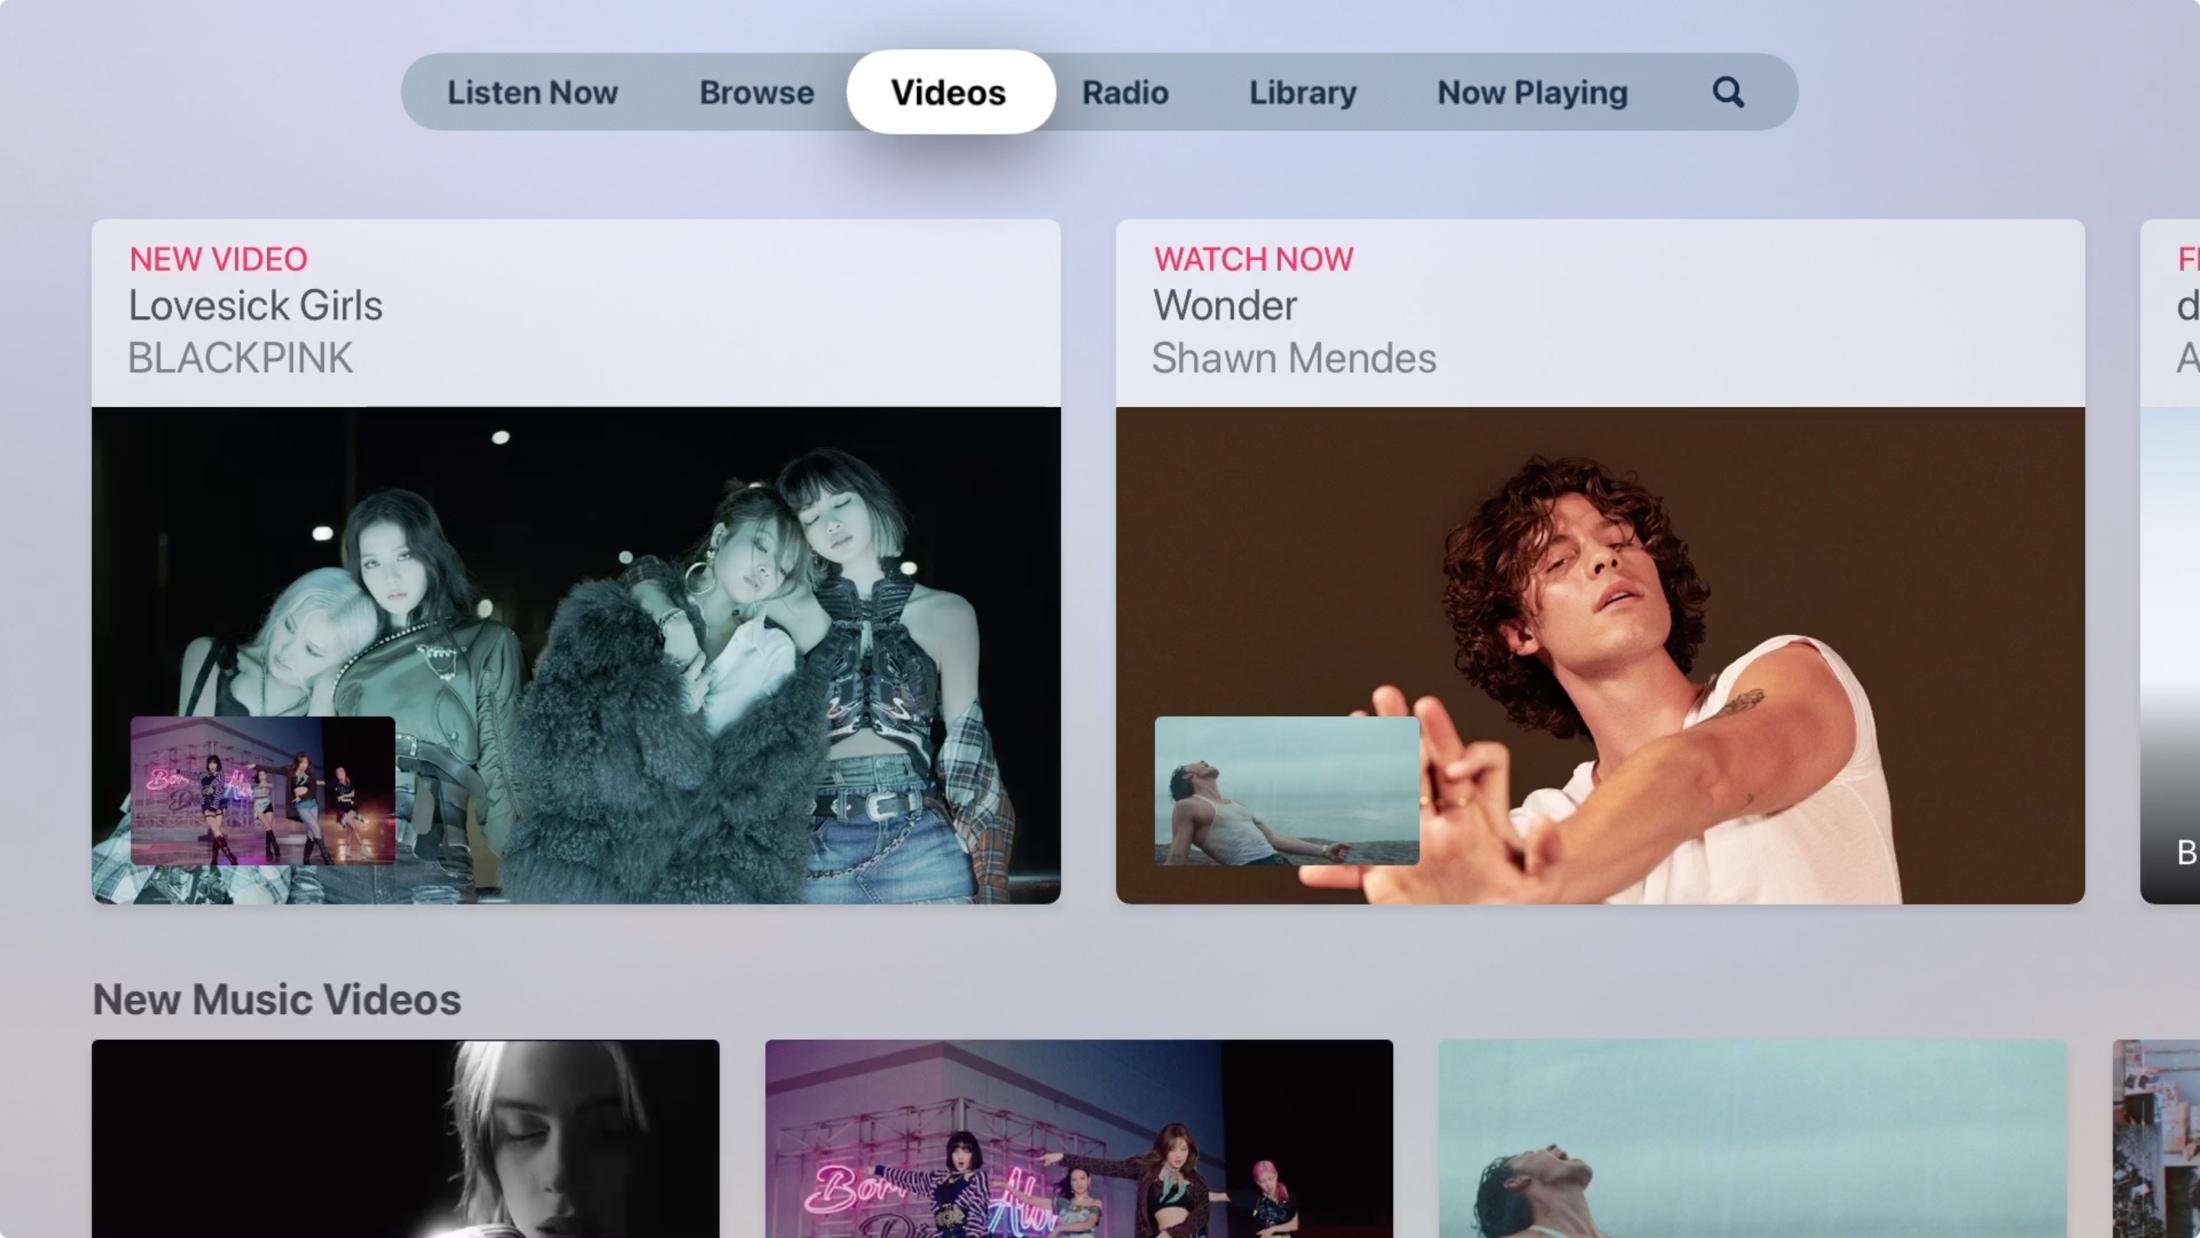 Videos in Music on Apple TV